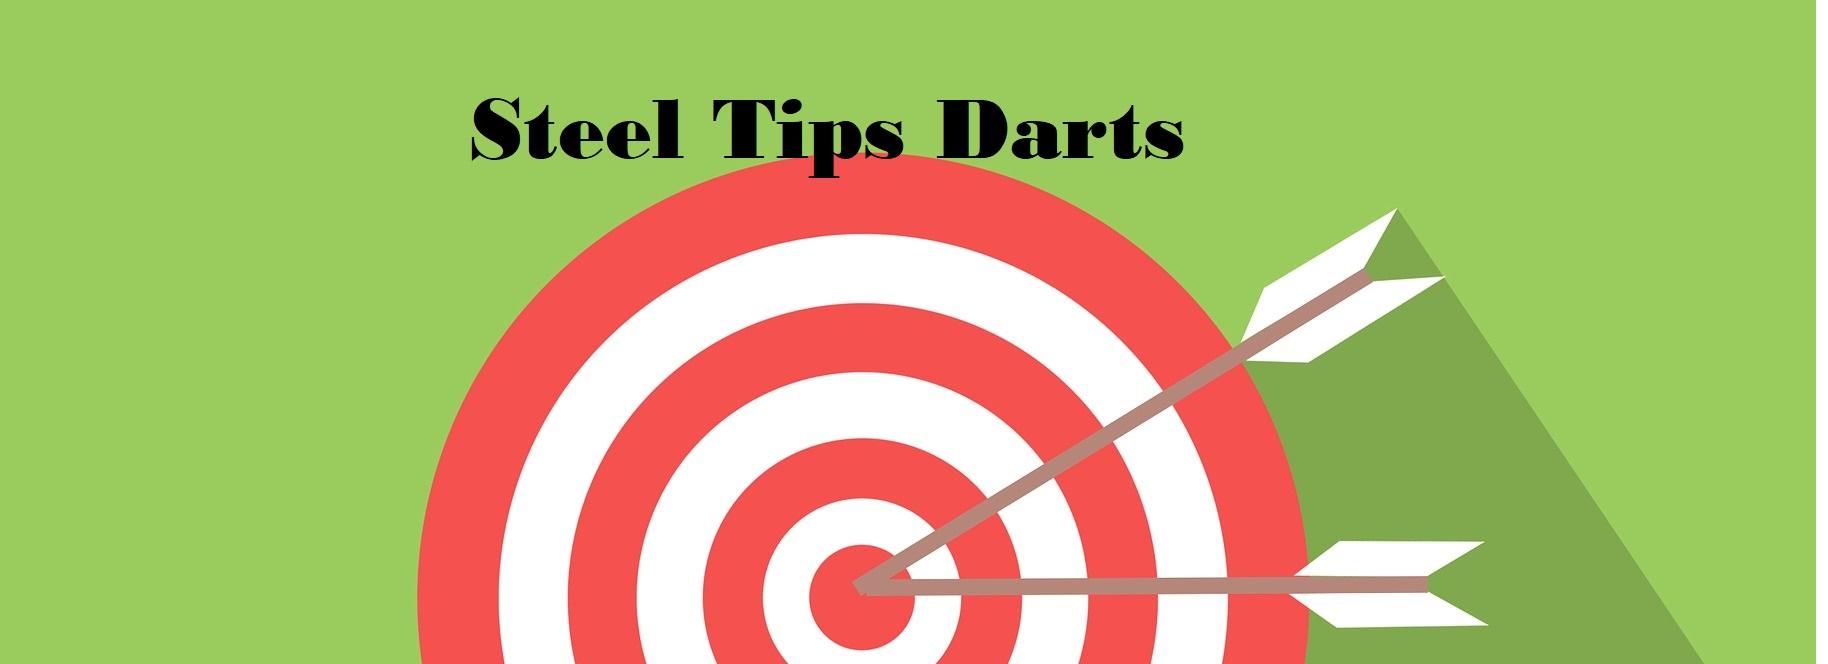 Steel Tips Darts